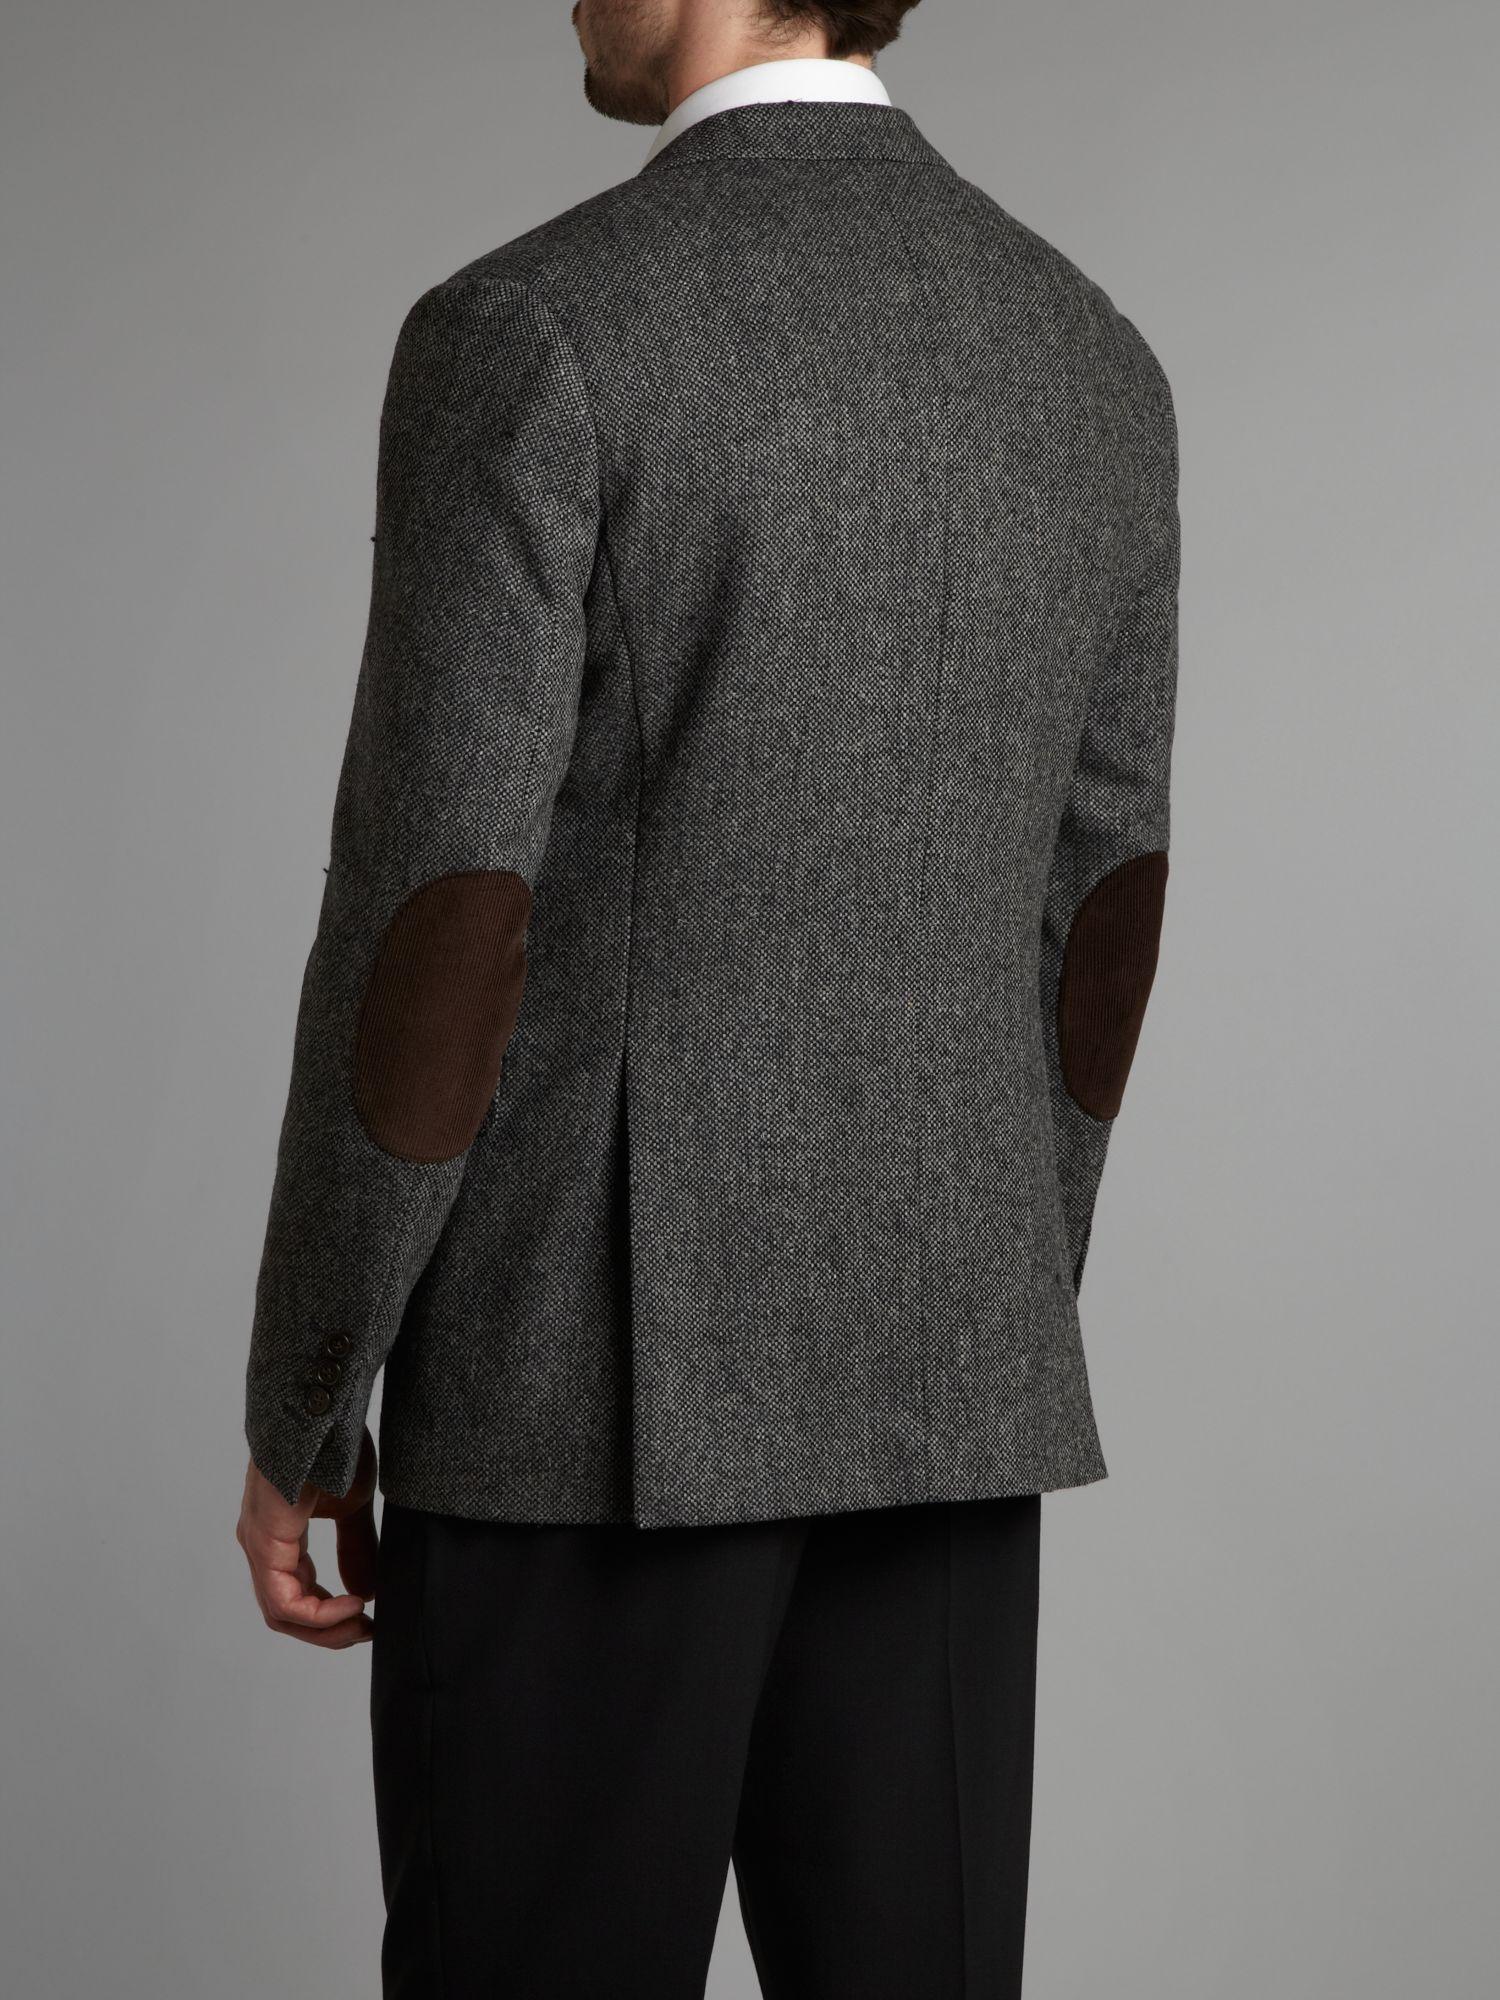 Gant Tweed Jacket in Gray for Men | Lyst